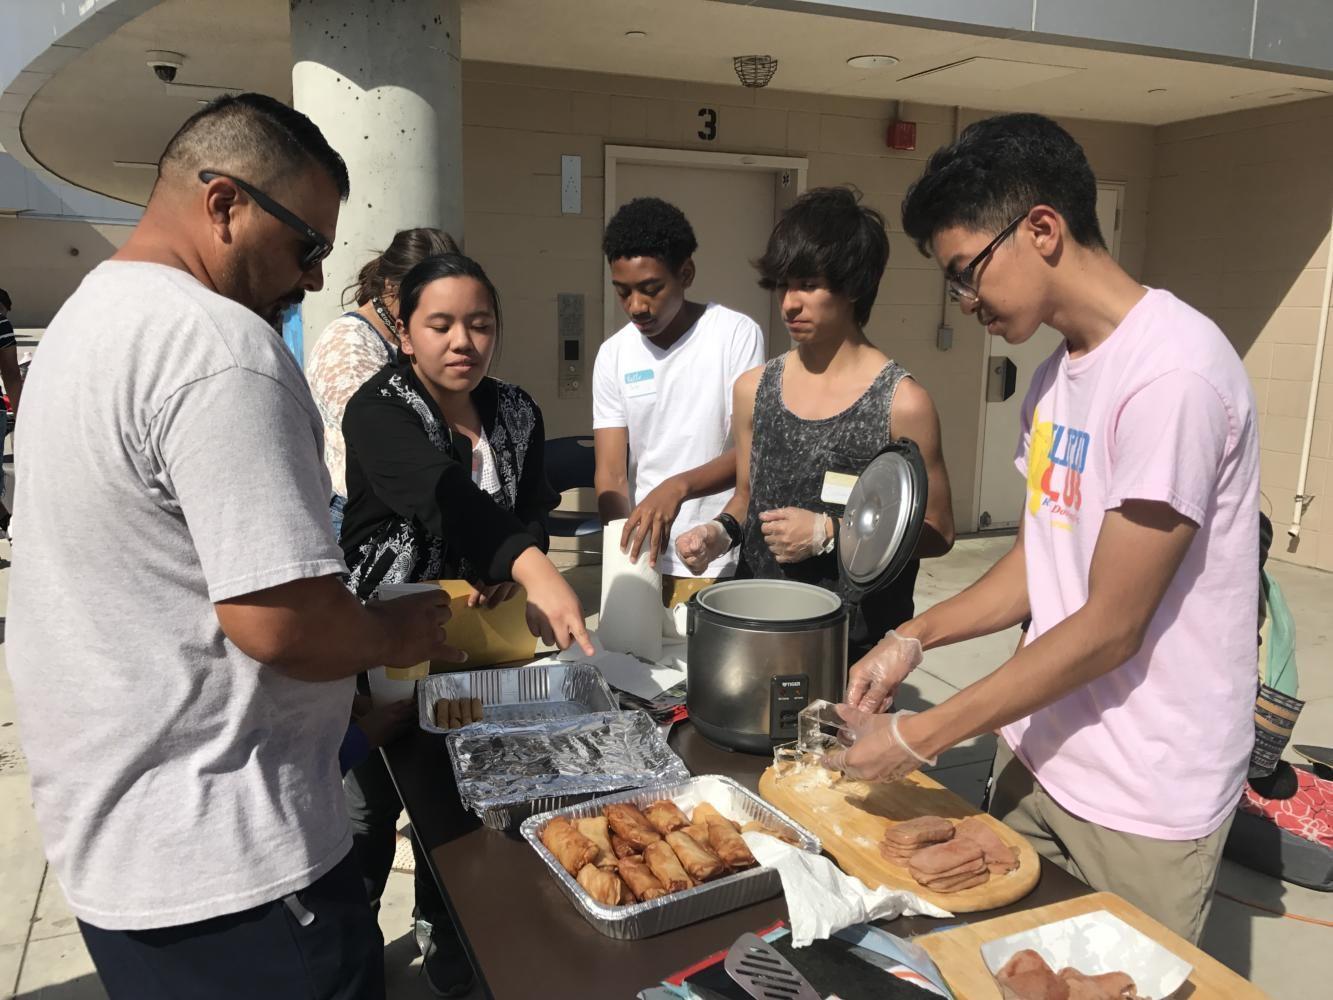 Rancho+Dominguez%27s+Filipino+Club+serving+Eggrolls%2C+Spam+Musubi%2C+and+Turon